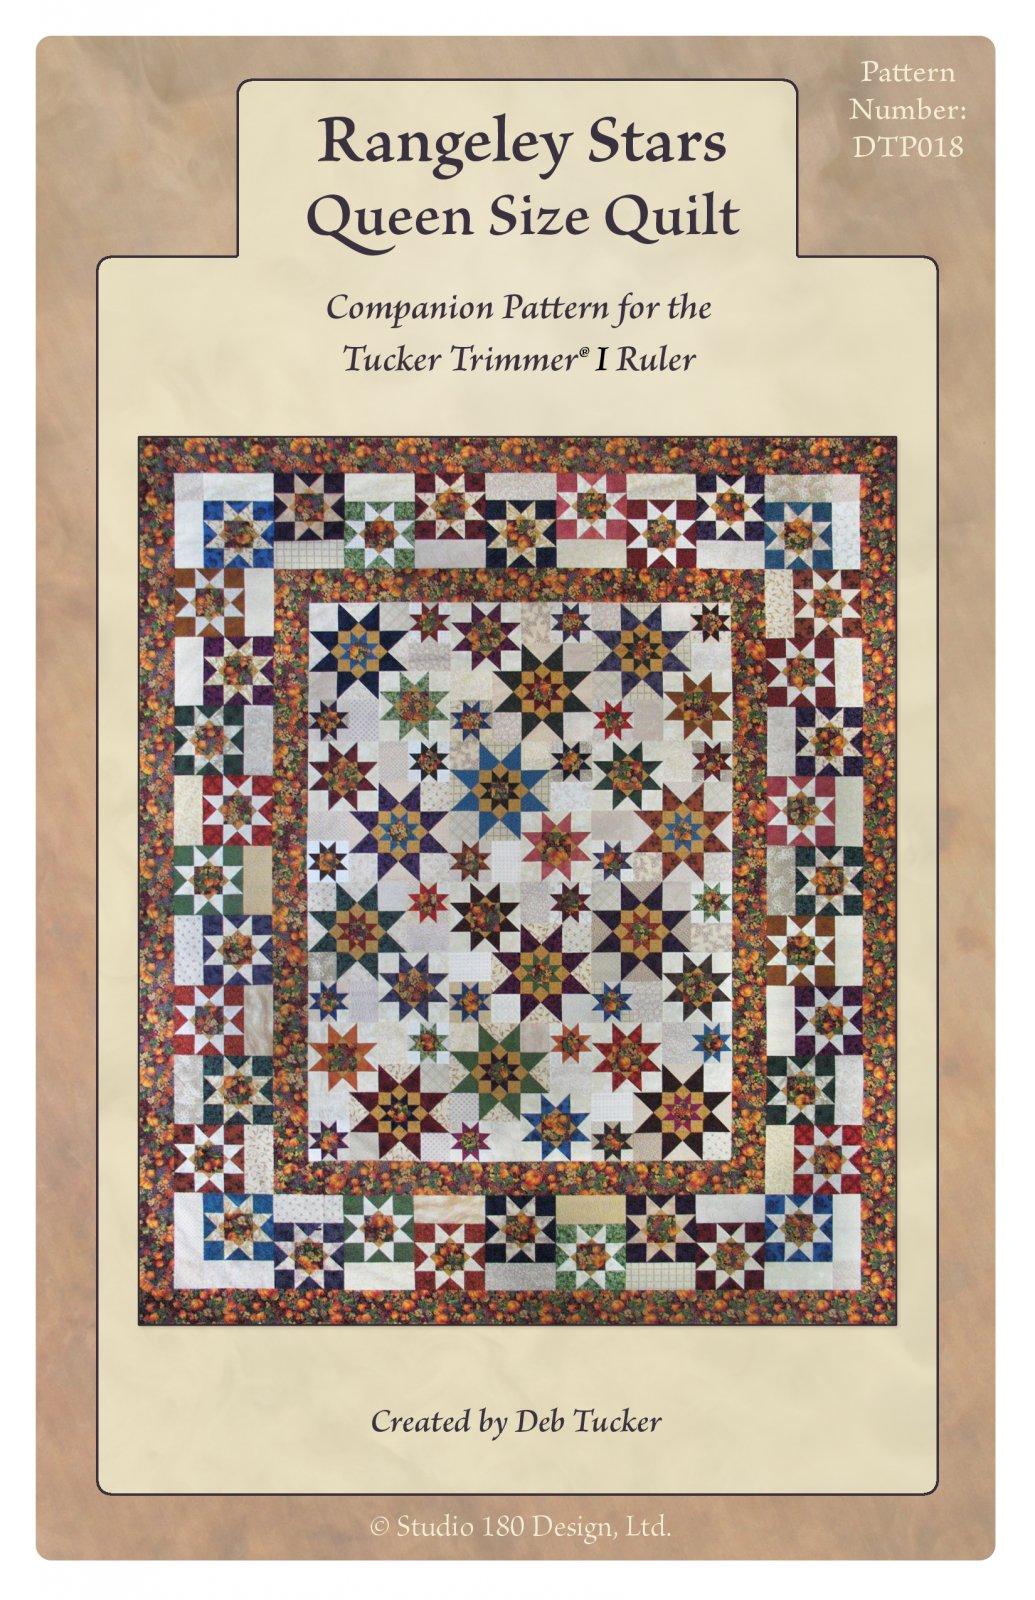 Rangeley Stars Quilt Pattern - Deb Tucker - Studio 180 Design